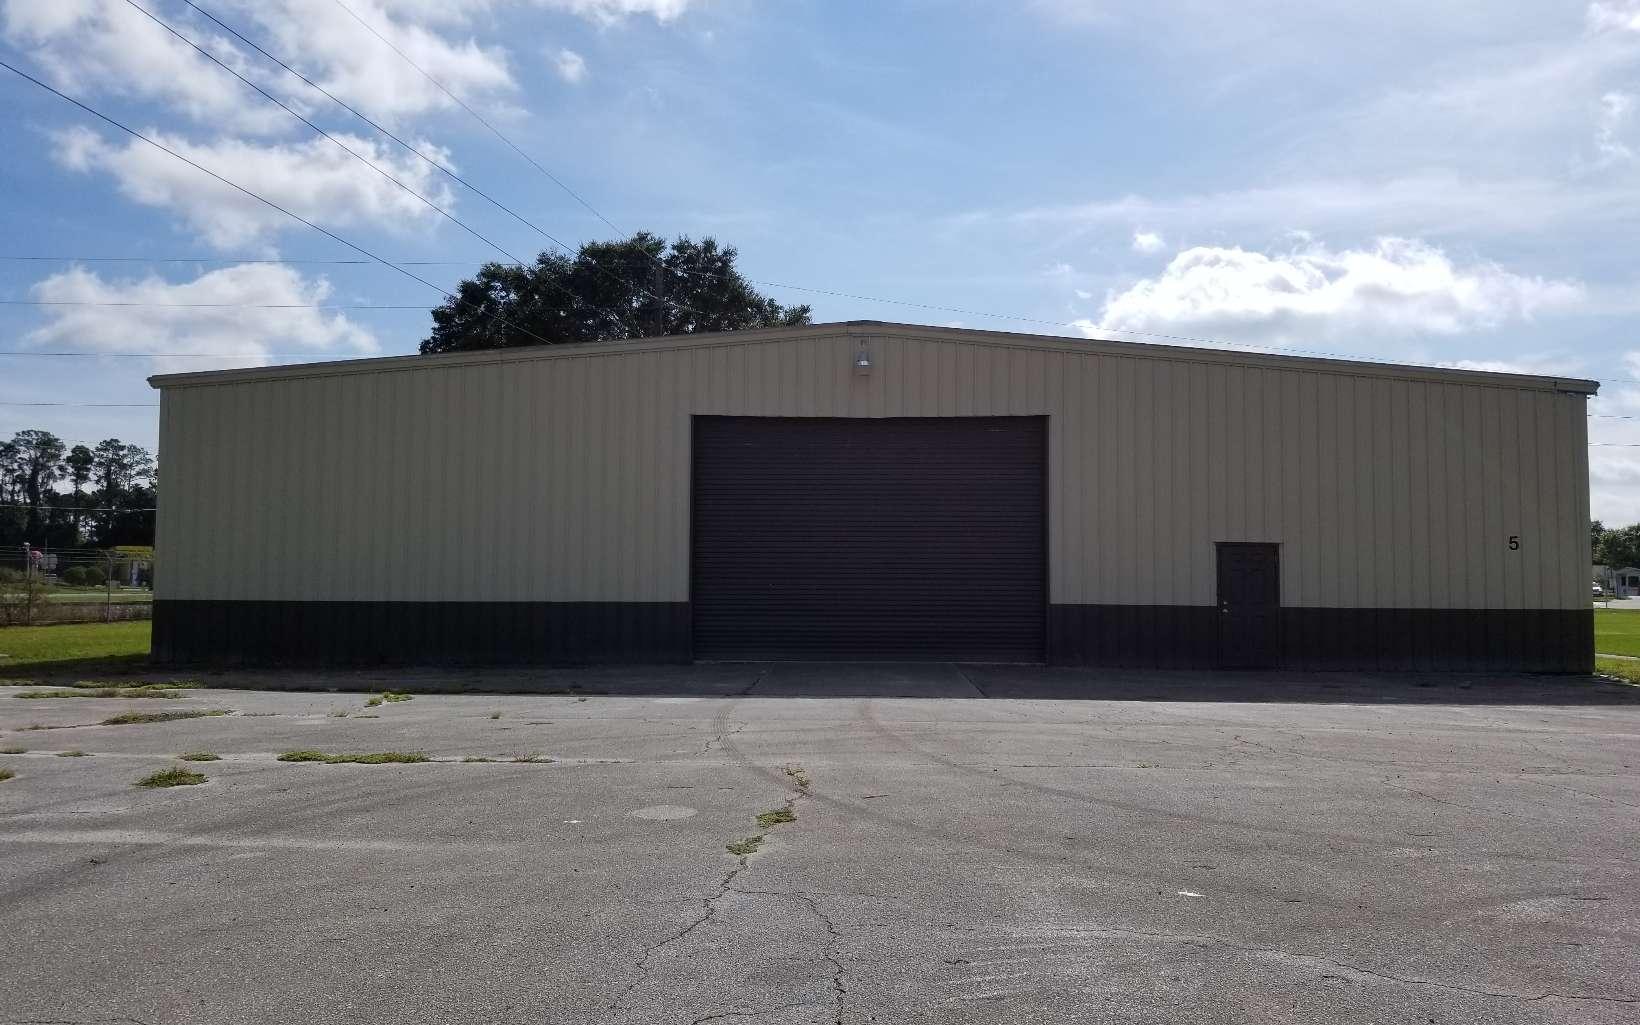 296 SE SR 100 WAREHOUSE 3, Lake City, FL 32025